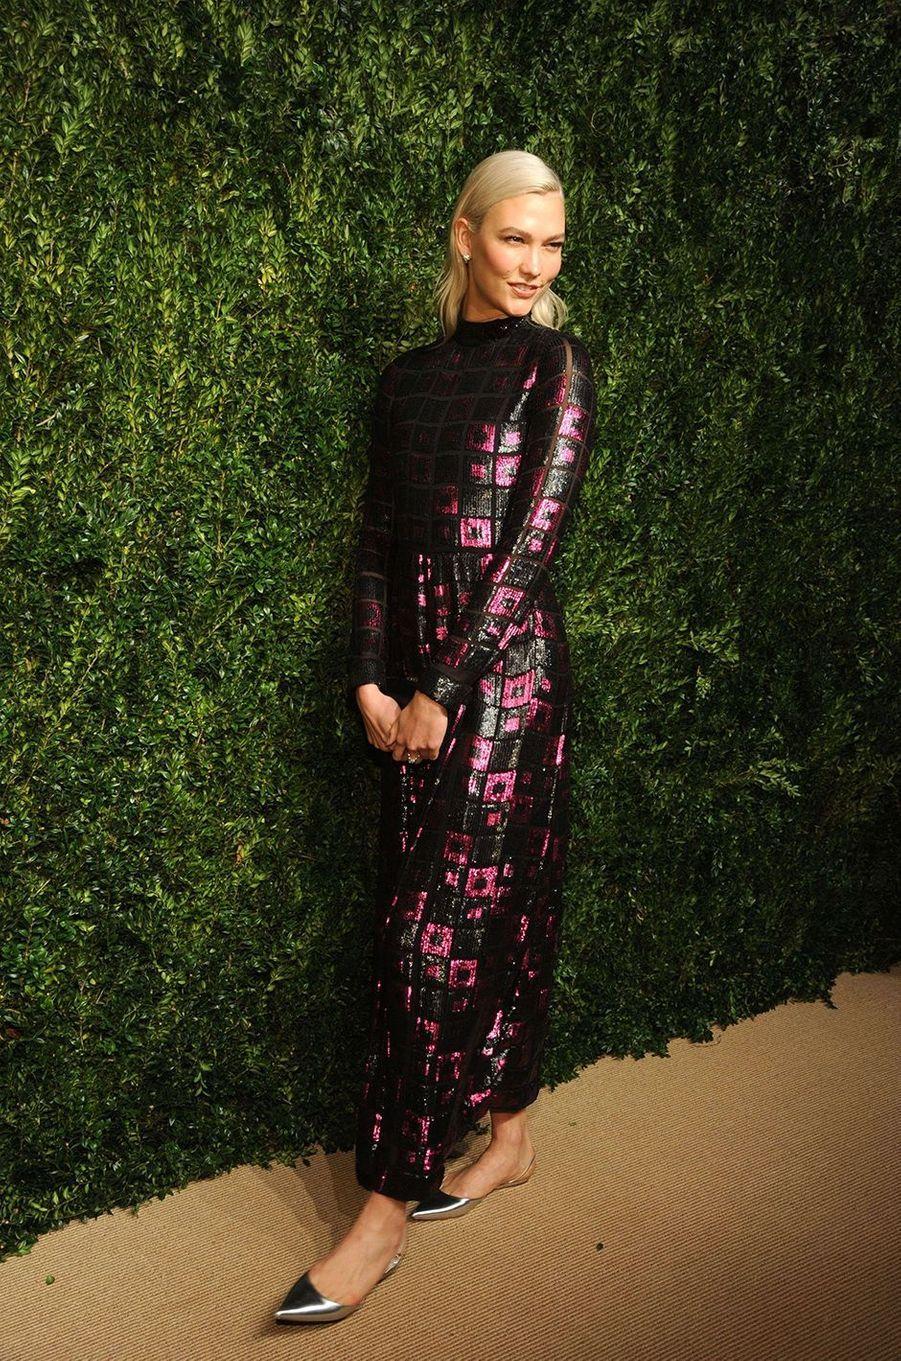 Karlie Kloss aux CFDA Fashion Awards, à New York, le 6 novembre 2017.